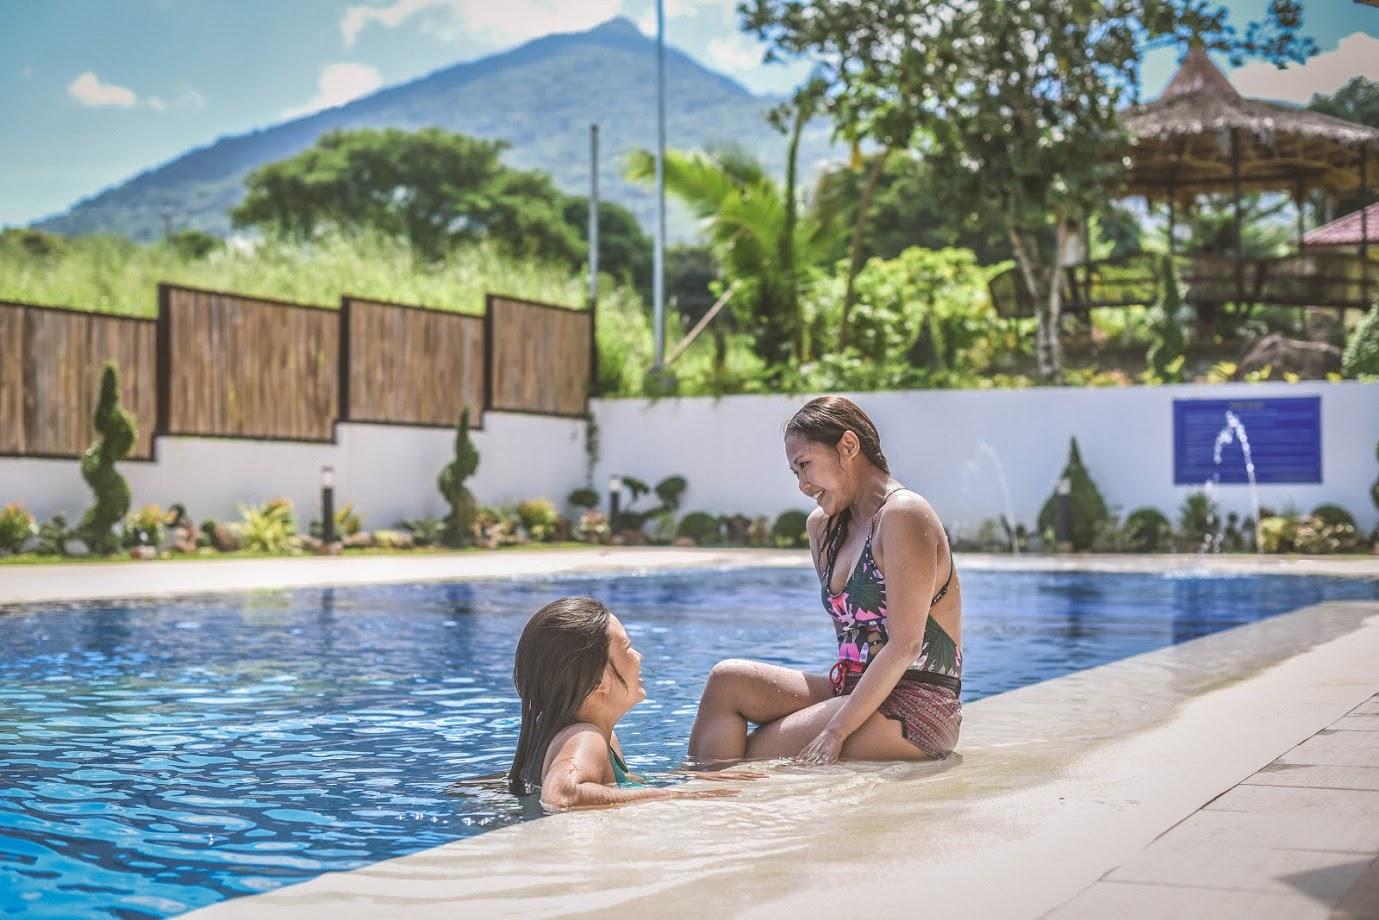 Affordable Long Weekend Destinations Near Manila - Nauvoo Farm Resort Pampanga